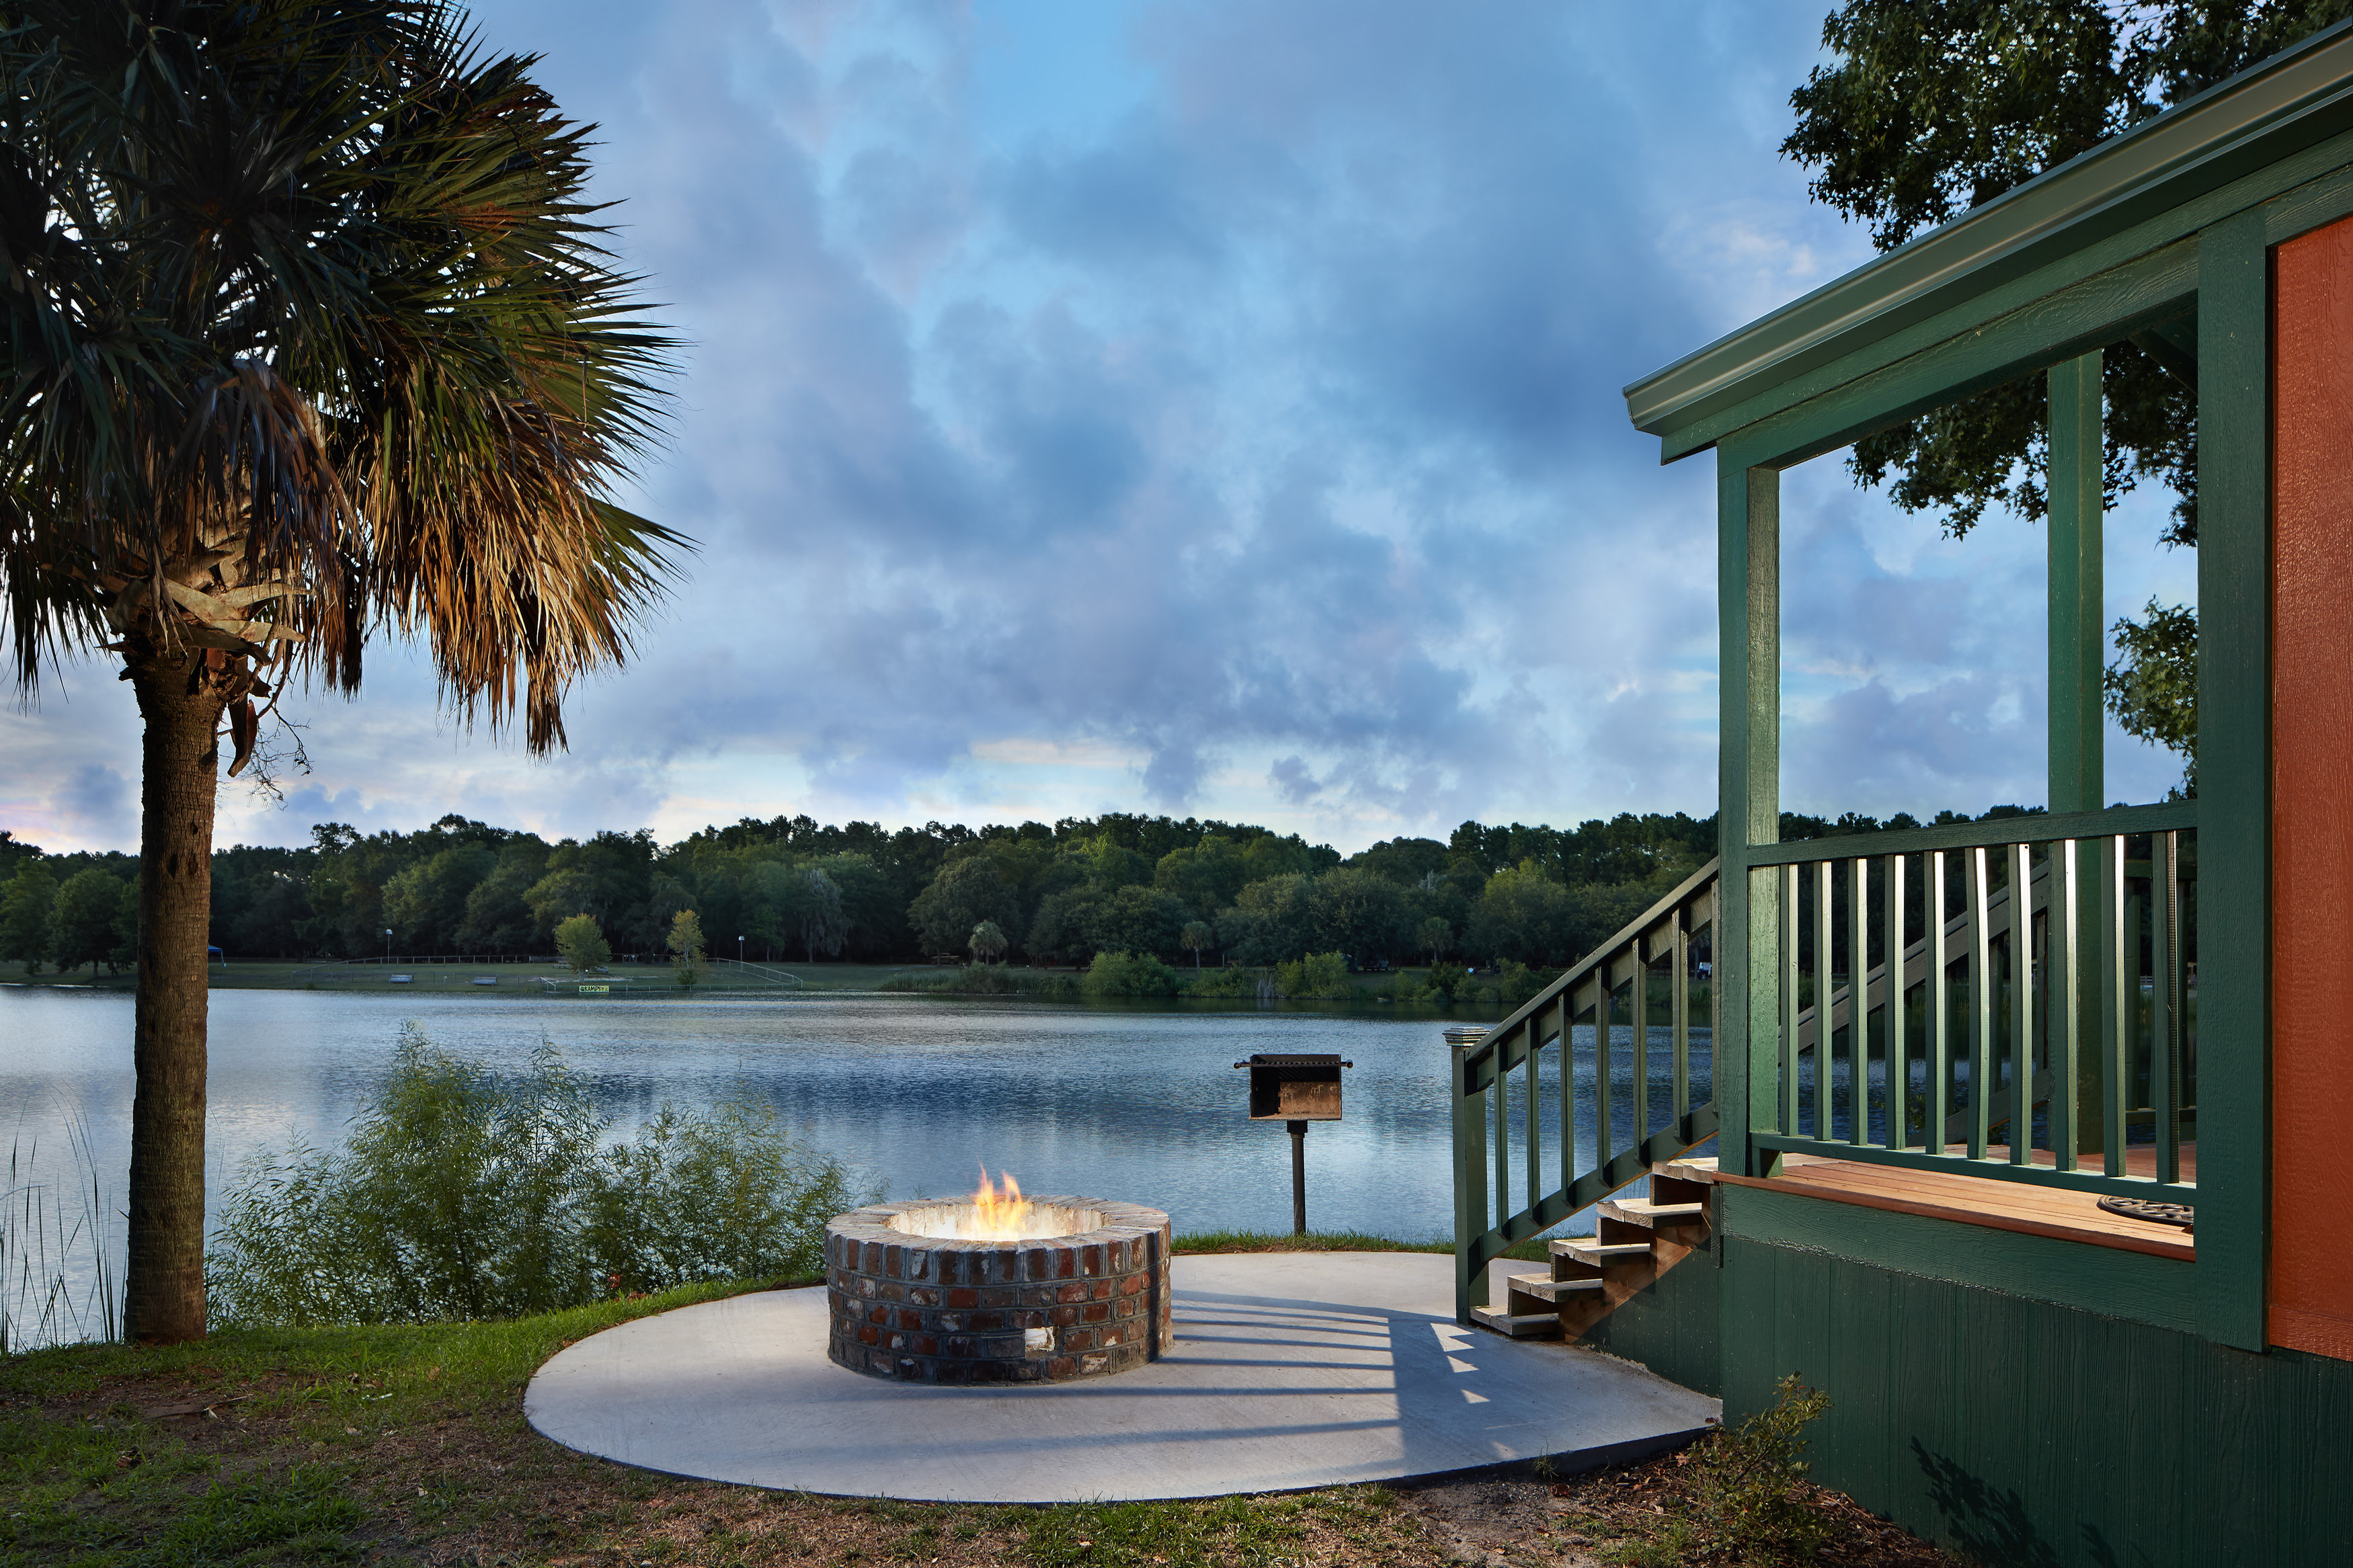 Mount Pleasant / Charleston KOA Holiday image 5